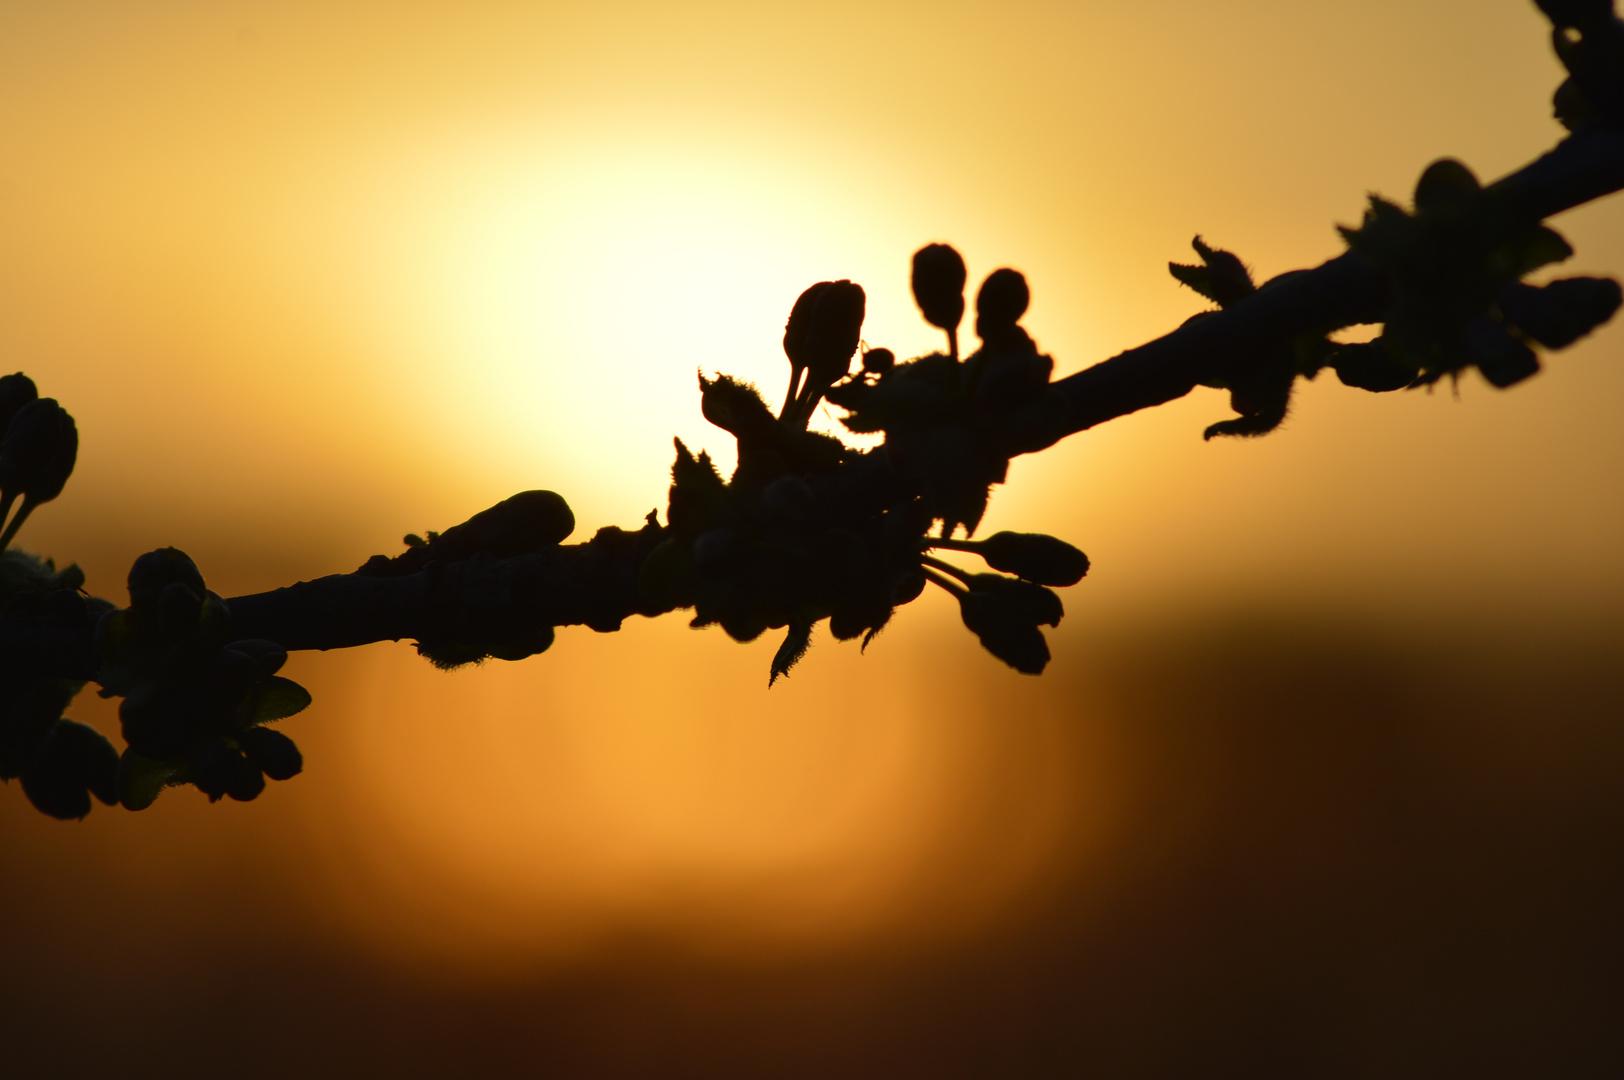 Frühlingserwachen im Sonnenuntergang